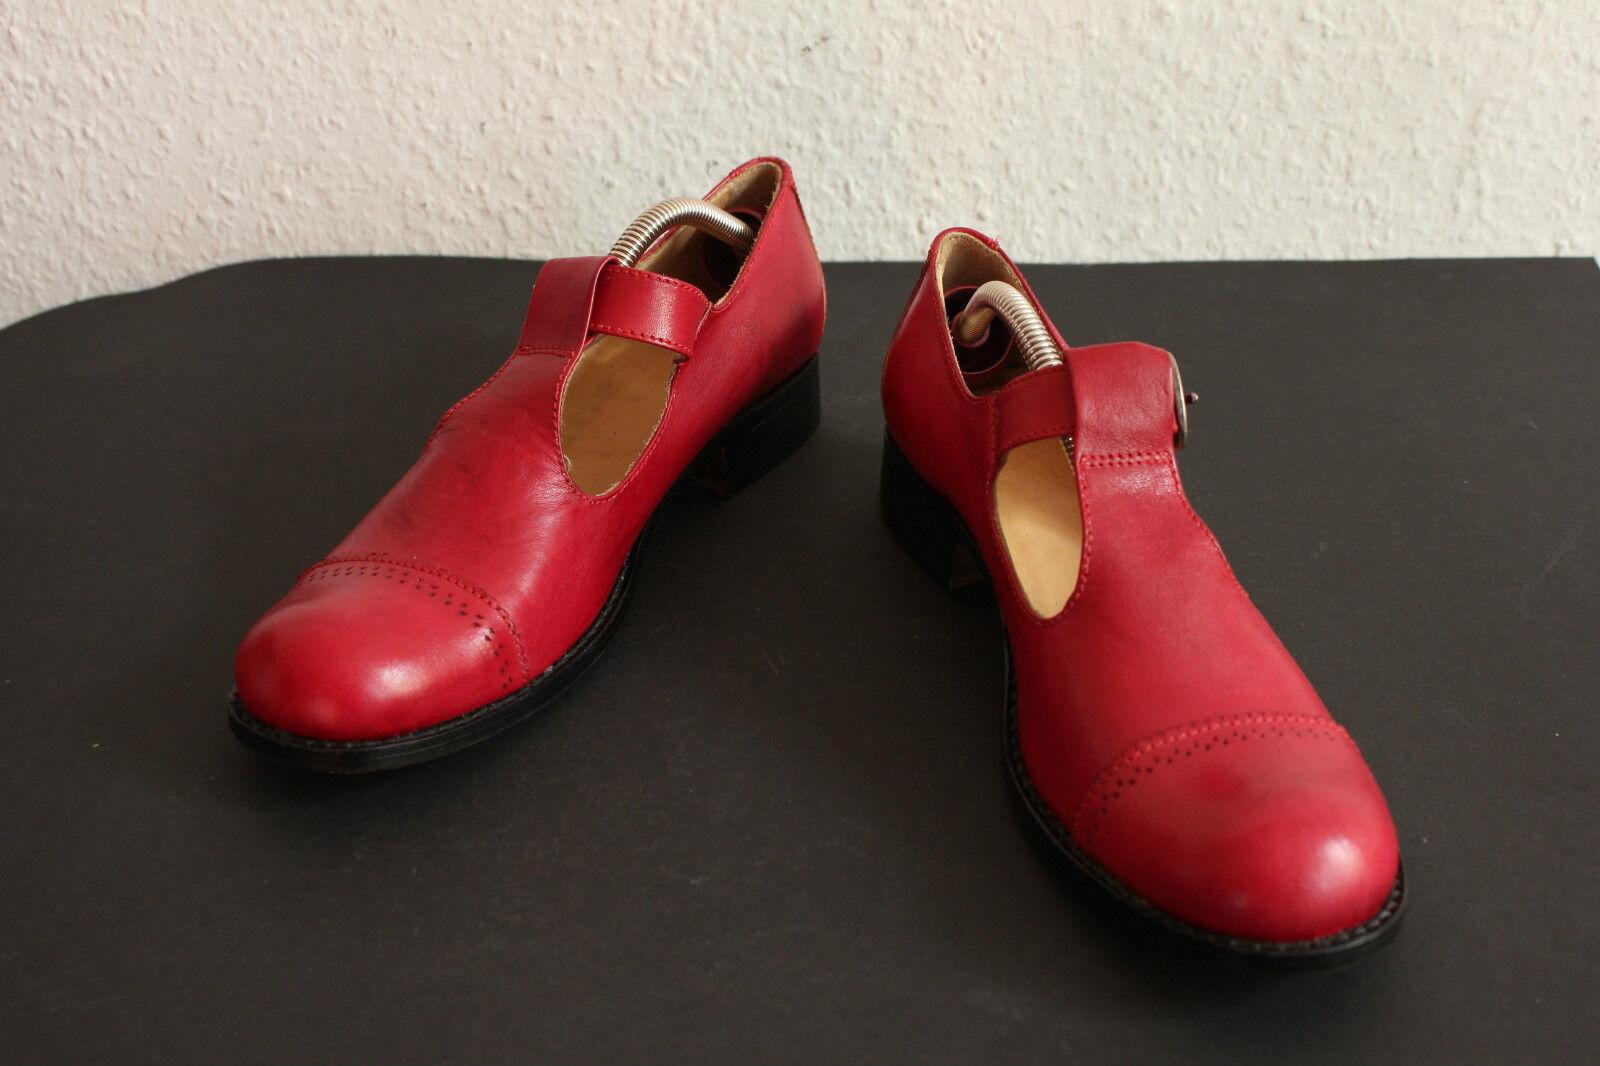 Vintage Impunture Mary Jane Halbschuhe Riemchen Sandale Echtleder Rot 39 39,5